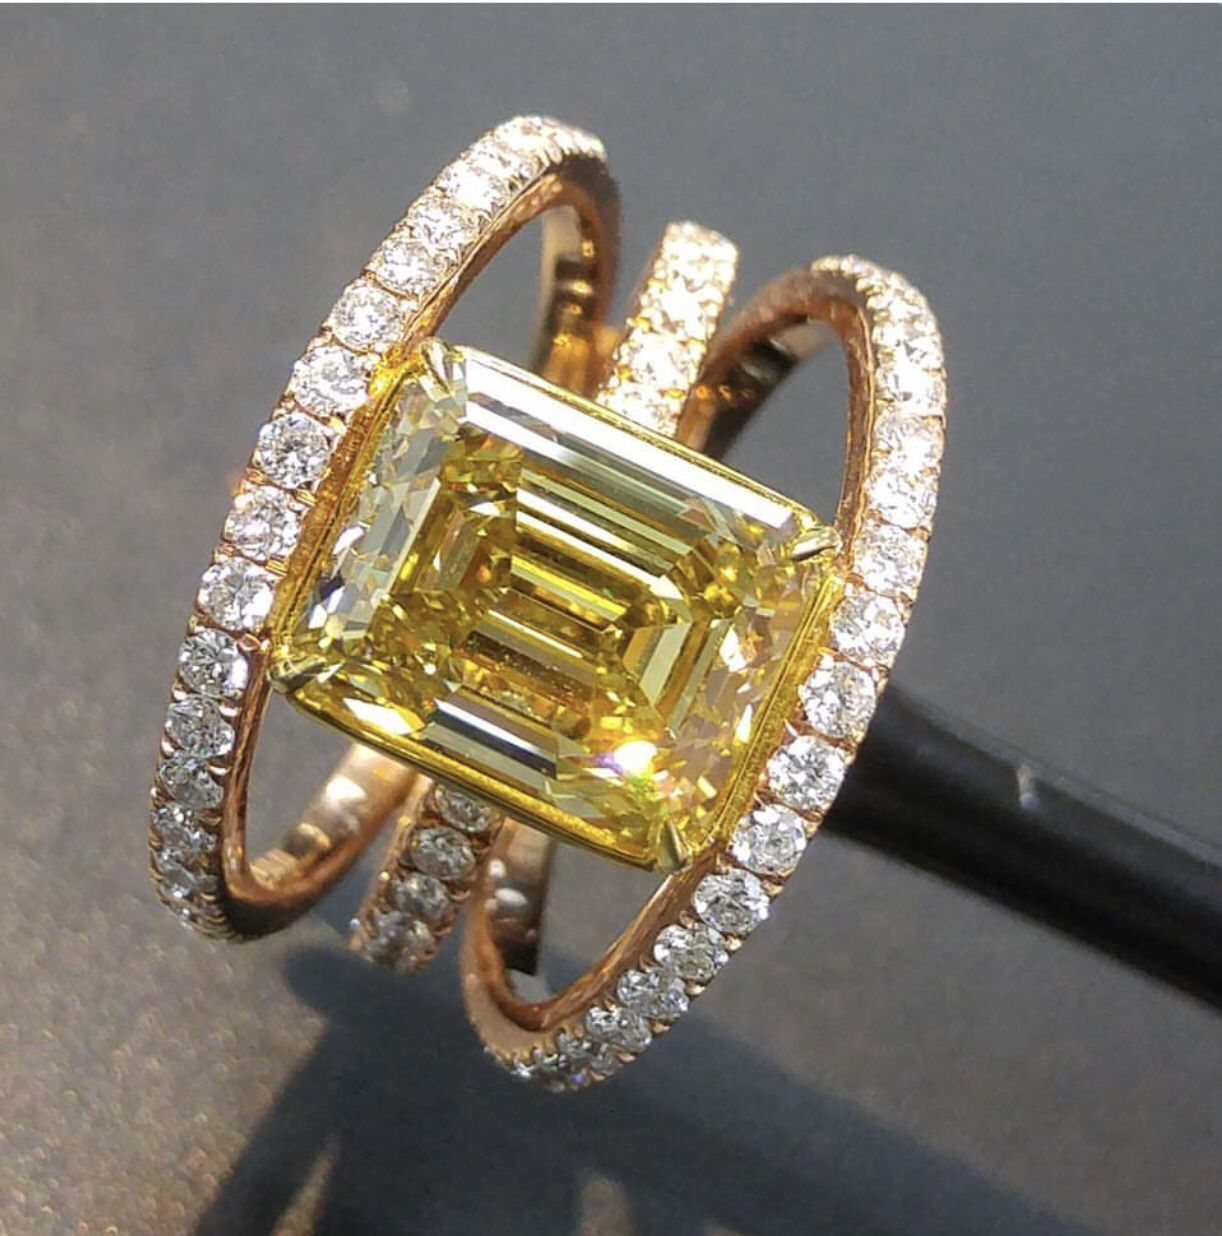 Pin By Jeanette Fierro On Jewellery Jewelry Diamond Jewelry Diamond